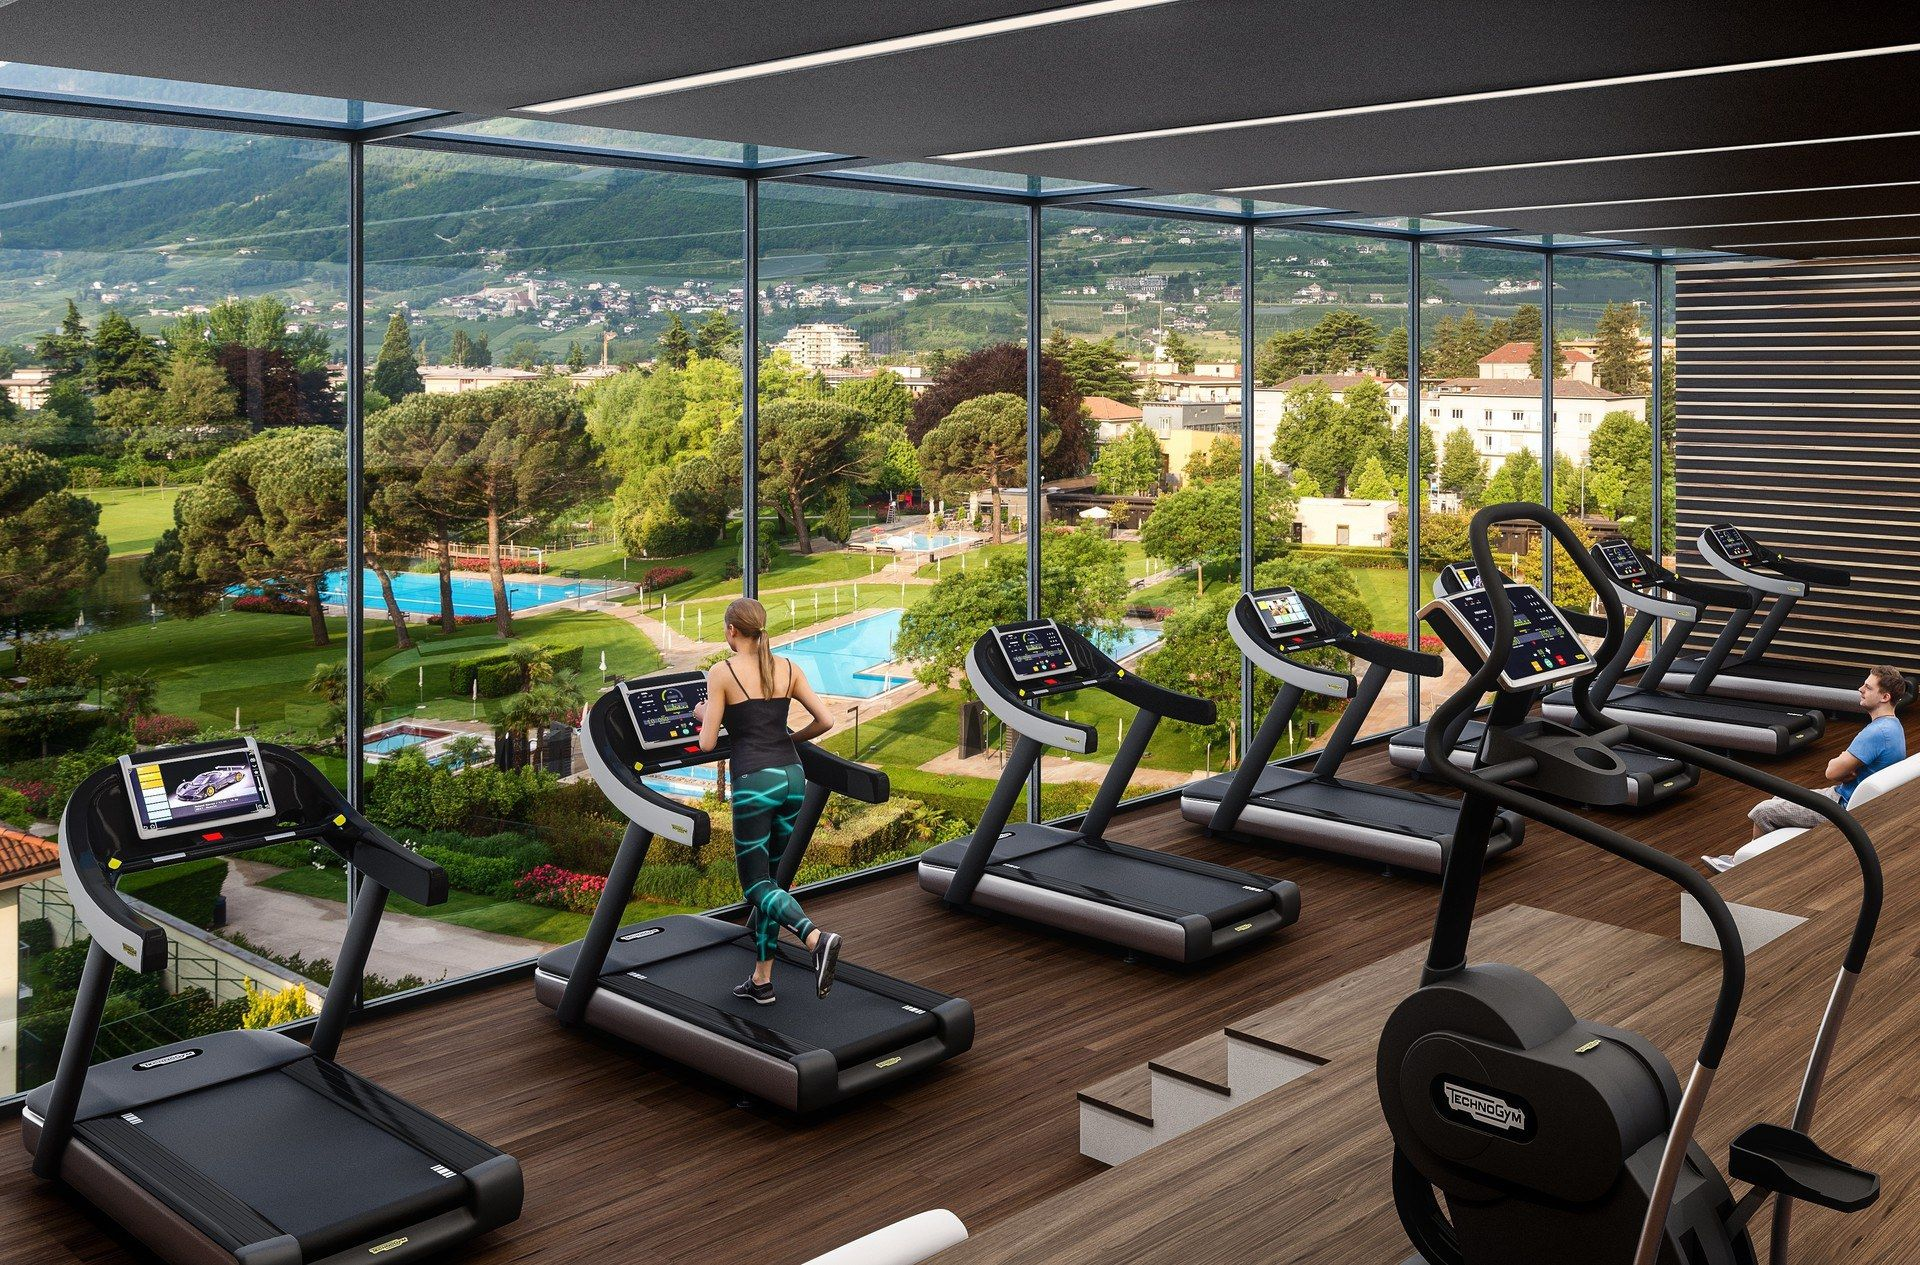 Fitnessraum hotel  Fitnessraum im Hotel Therme Meran #Thermemeran #Südtirol | Hotel ...